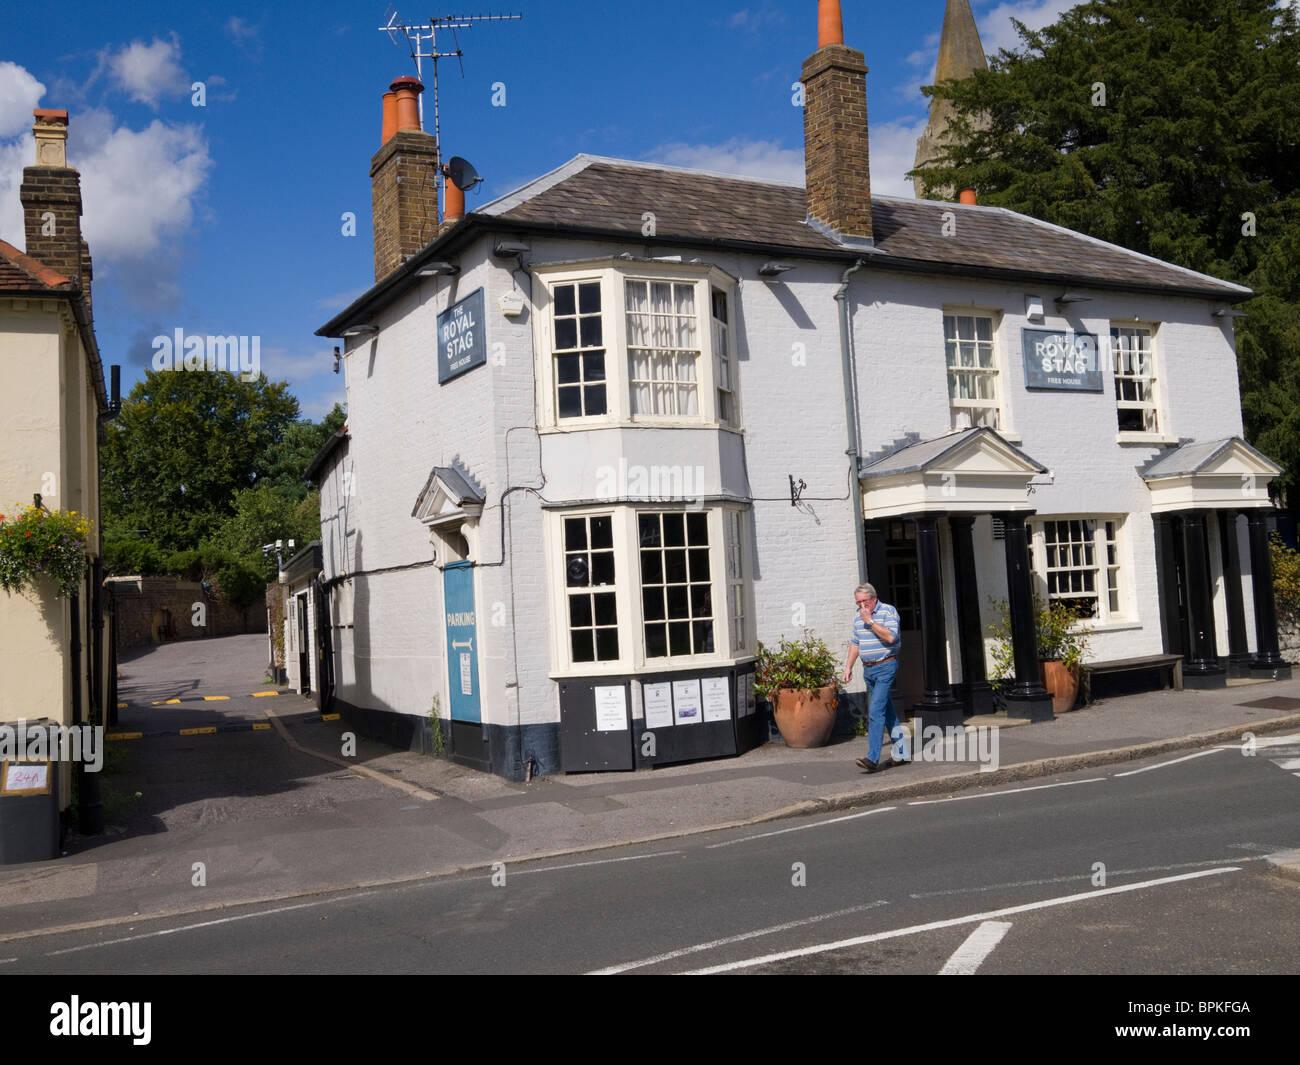 Datchet village pub, Berkshire, England - Stock Image